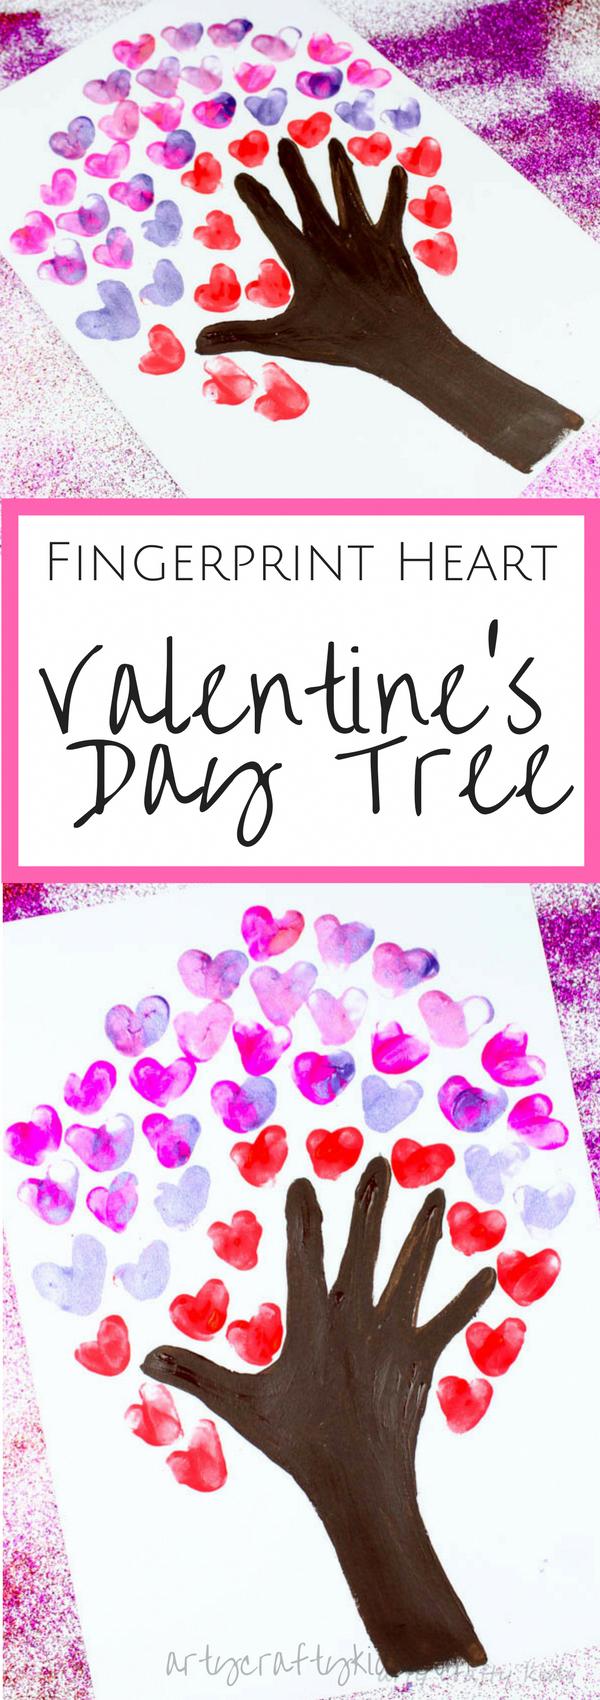 Fingerprint Heart Valentines Day Tree | Arty Crafty Kids